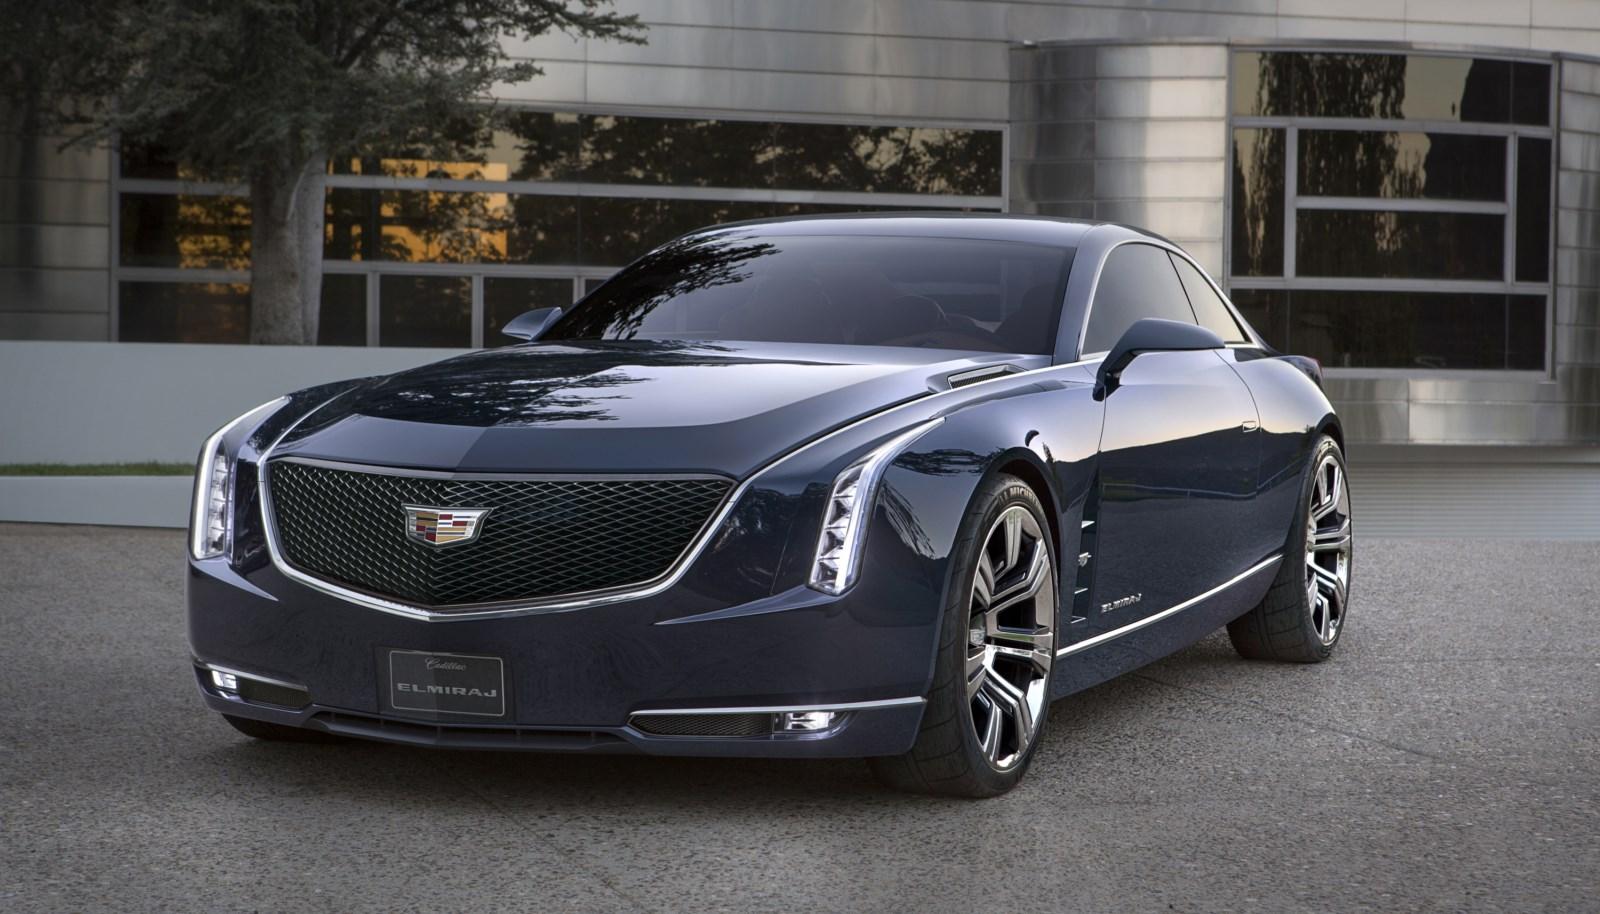 2021 Cadillac Elmiraj New Model and Performance